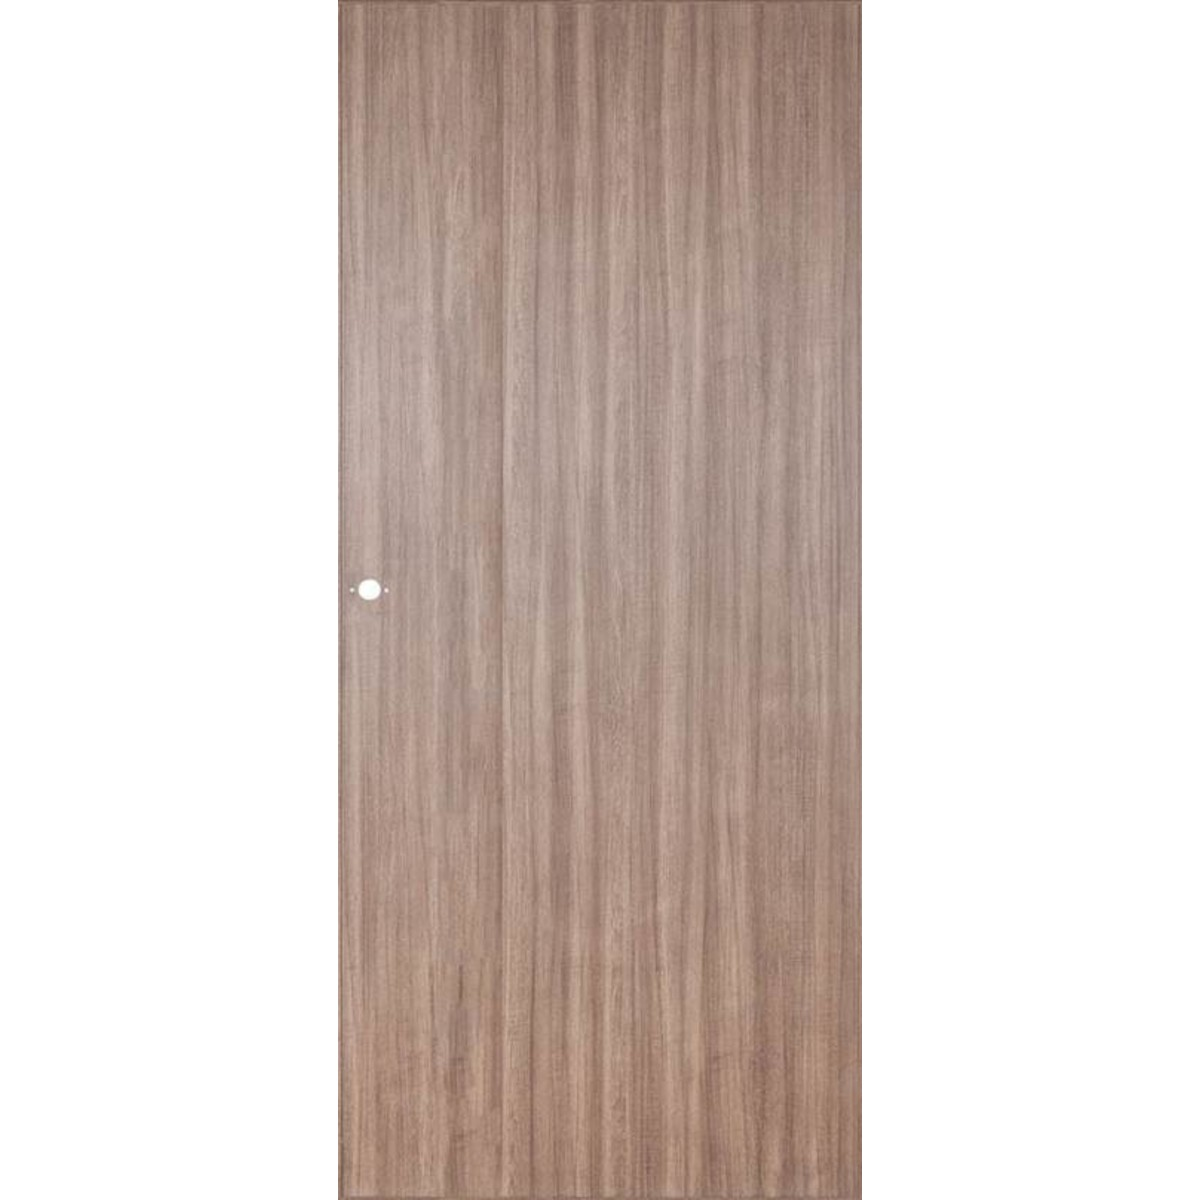 Дверь Межкомнатная Глухая Селена 60x200 Цвет Орех